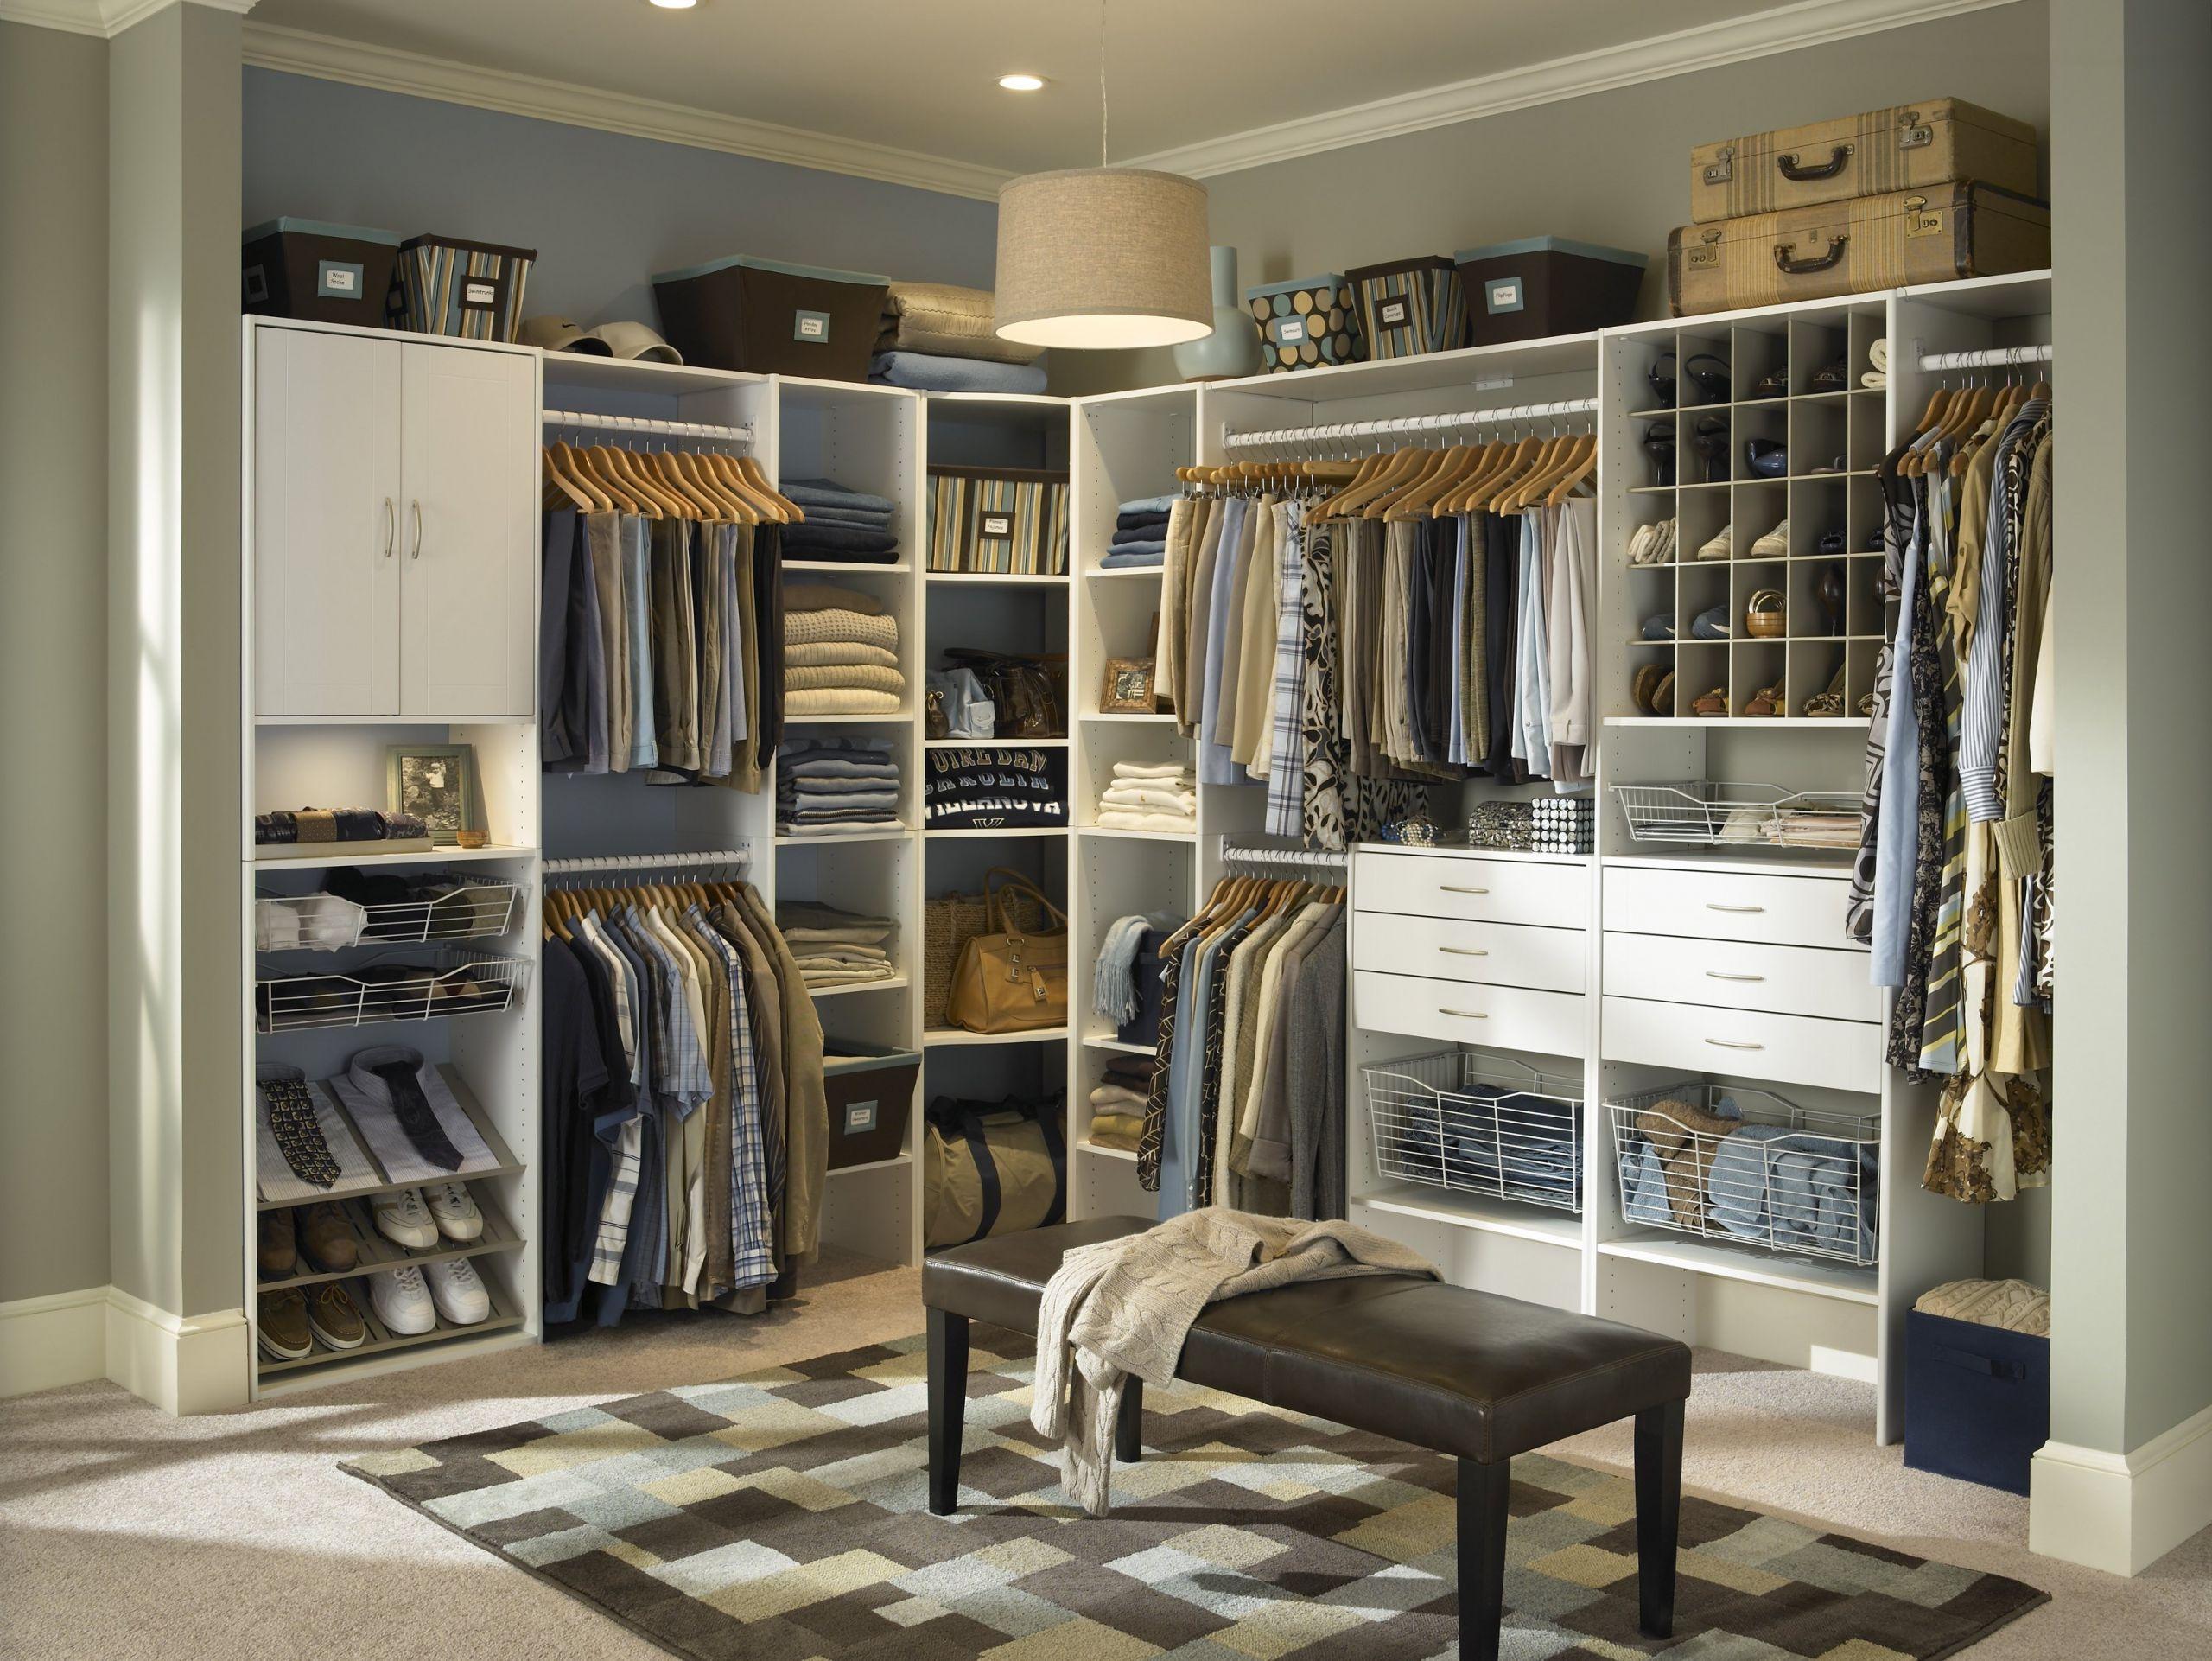 wardrobe 5 sq m design 1